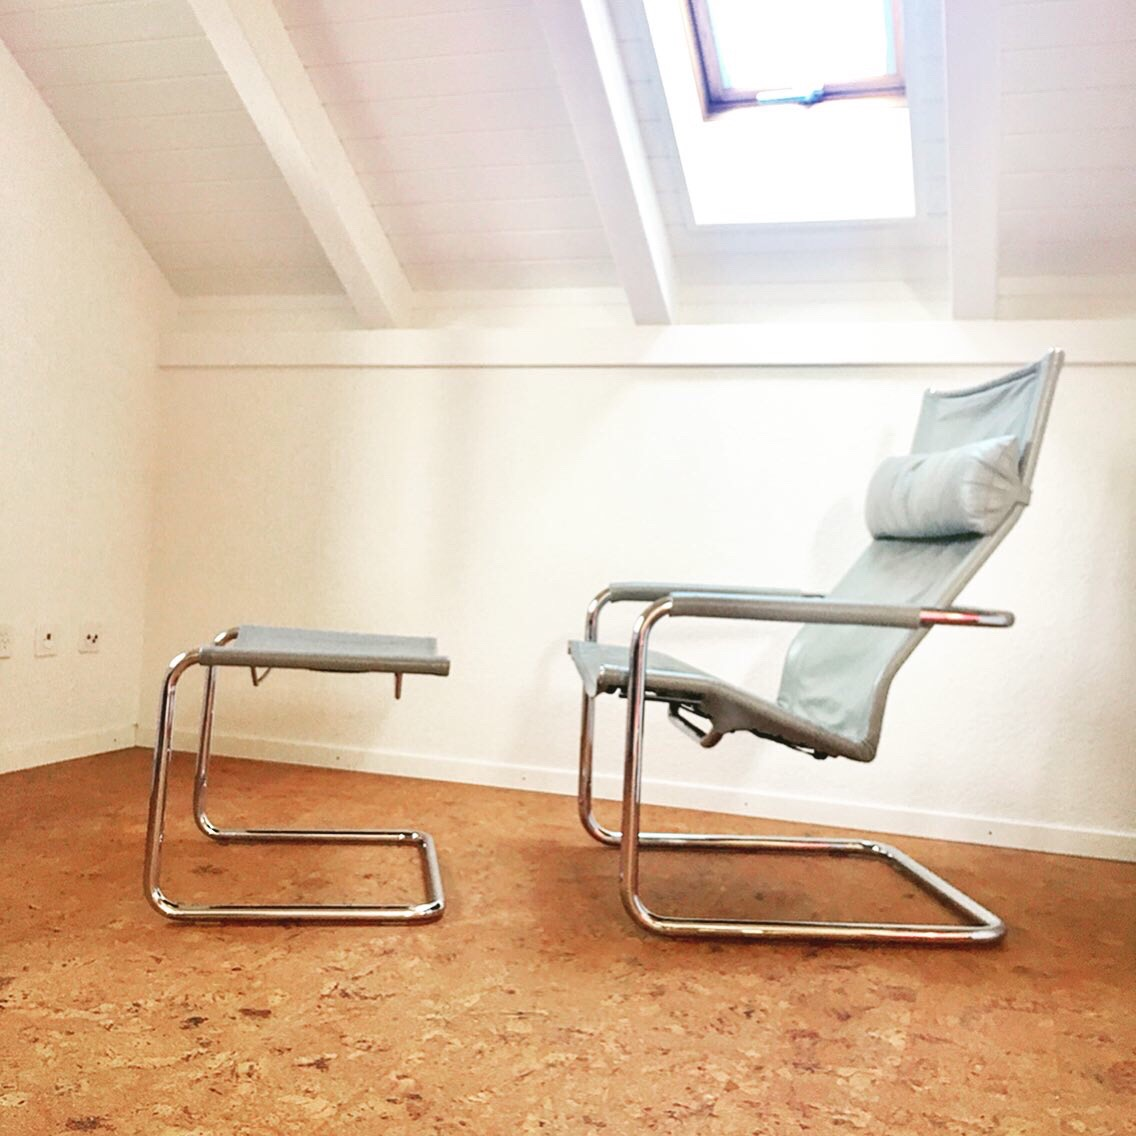 Bauhaus Epoche Sessel Stahlrohr-Möbel Vintage-Sessel Ledersessel mit Ottoman. Freischwinger Bauhaus Sessel.